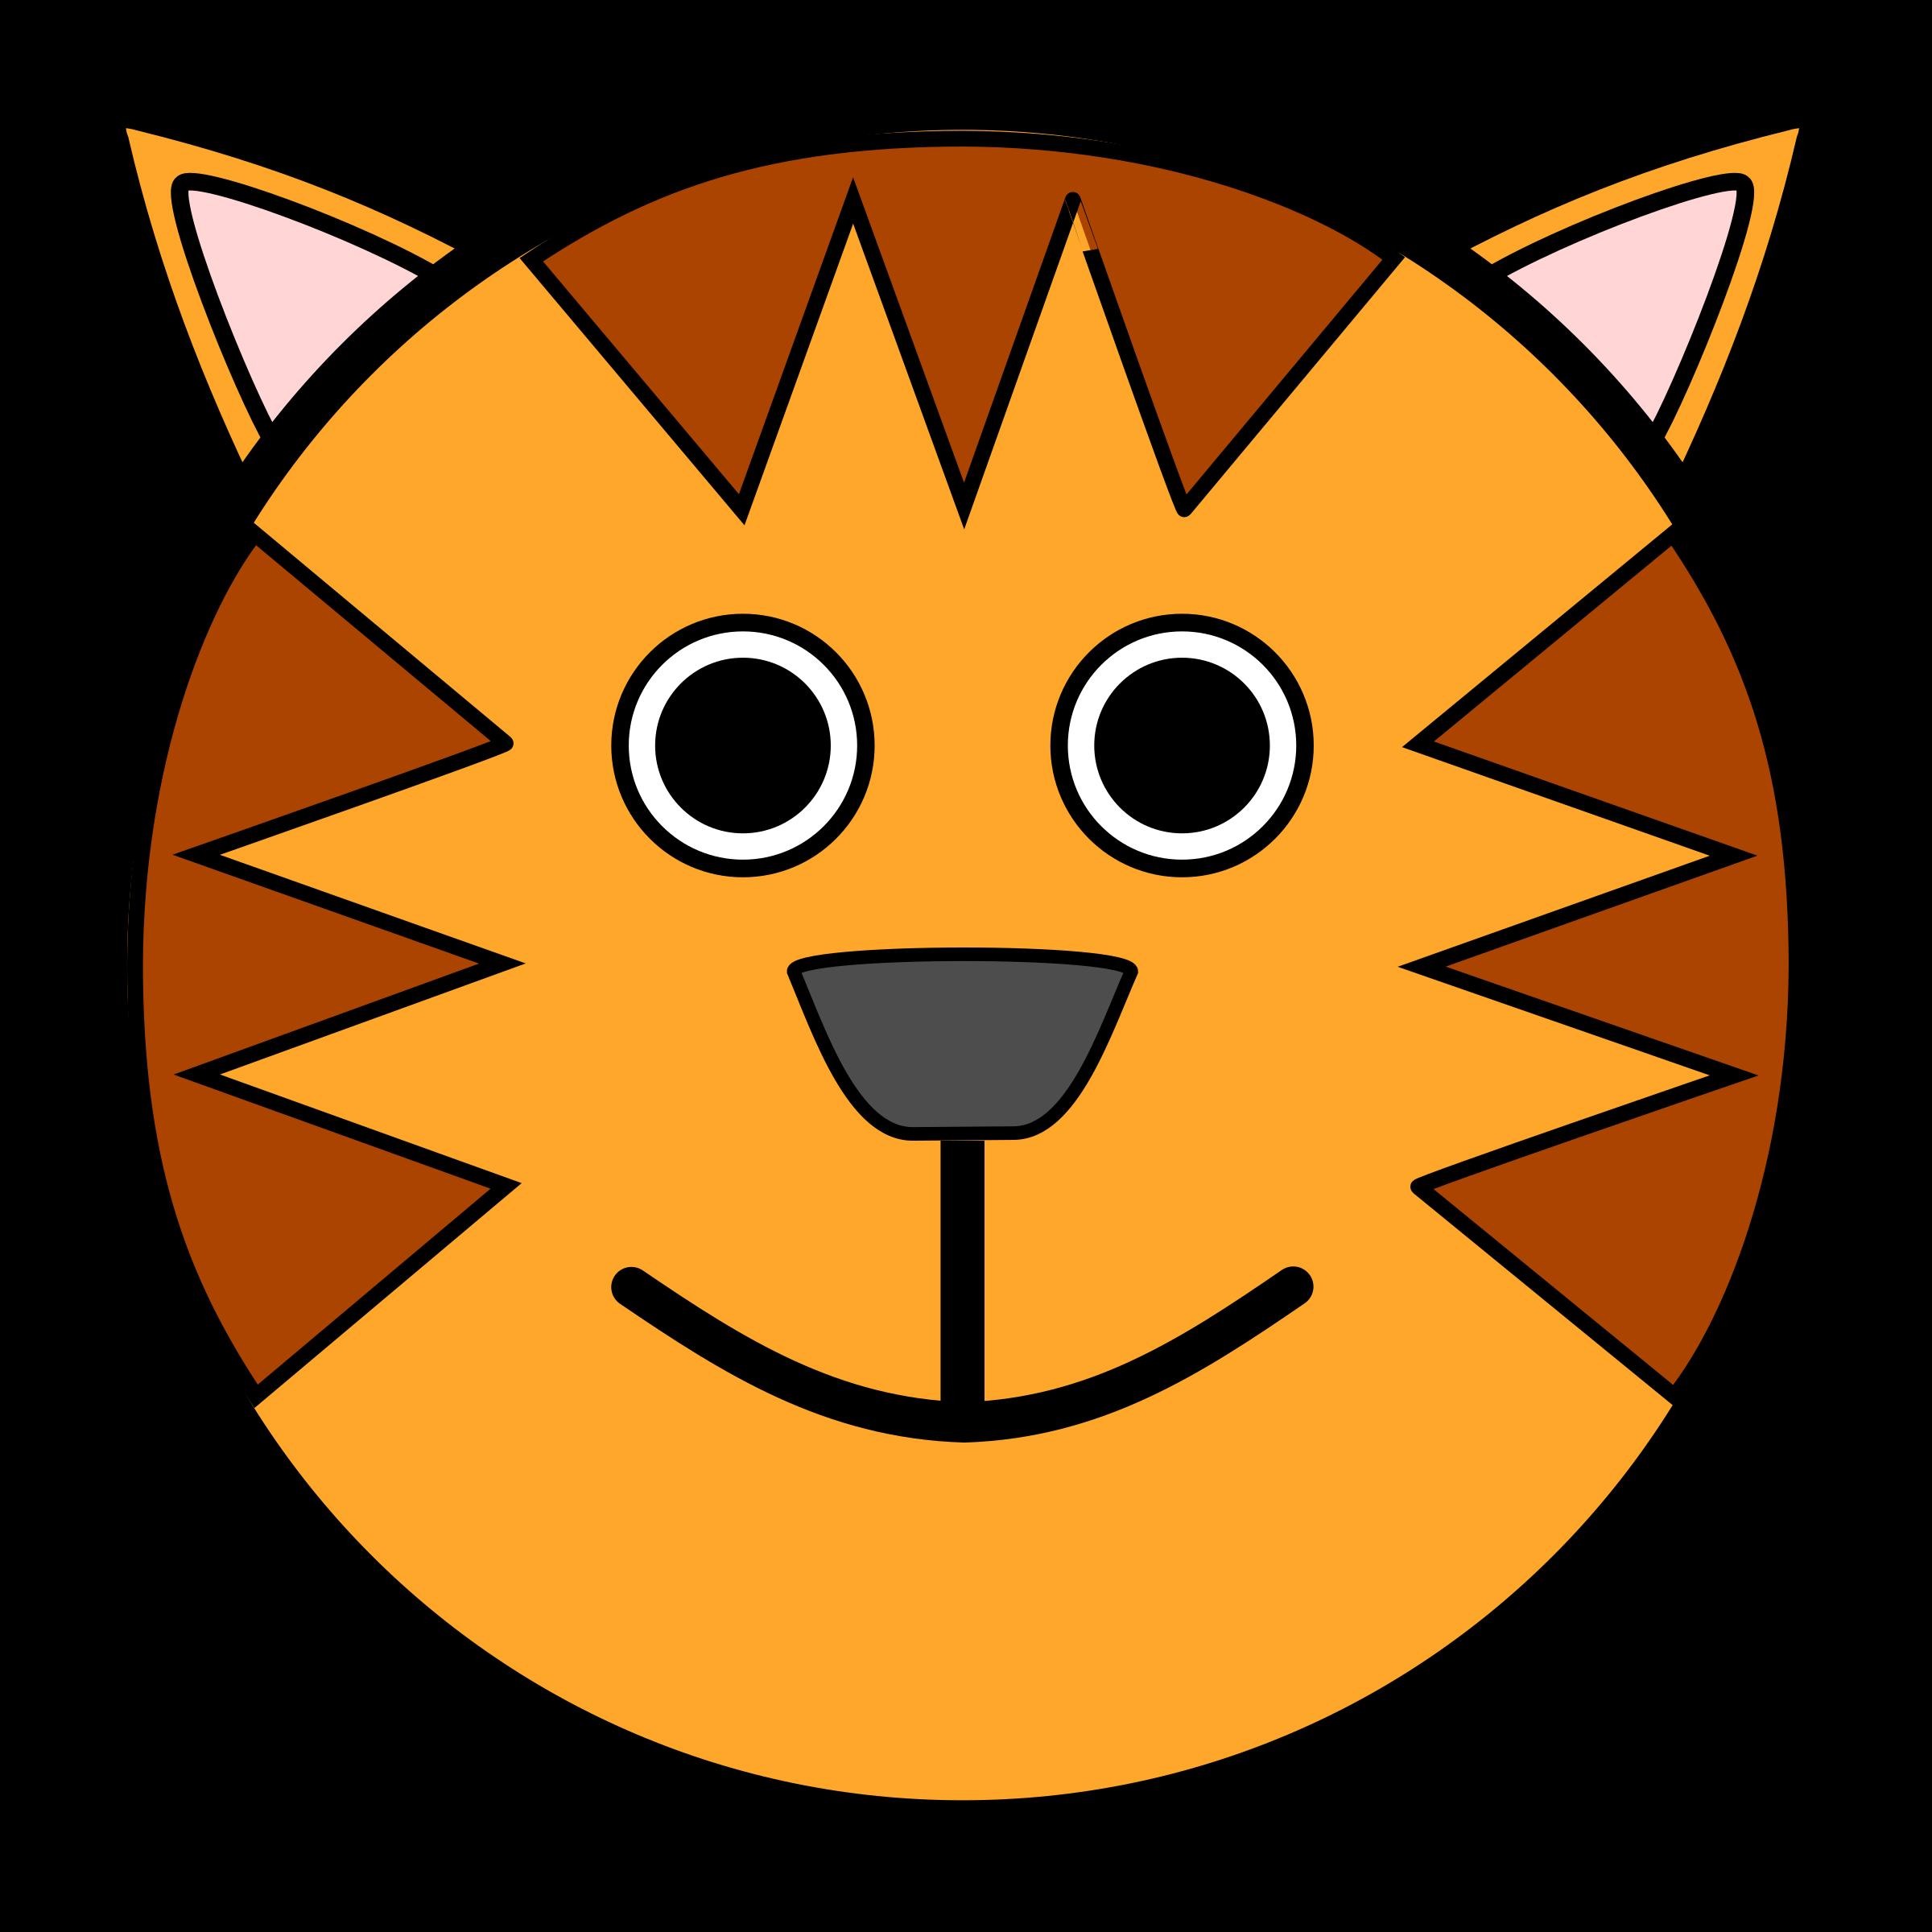 Tigre big image png. Open clipart